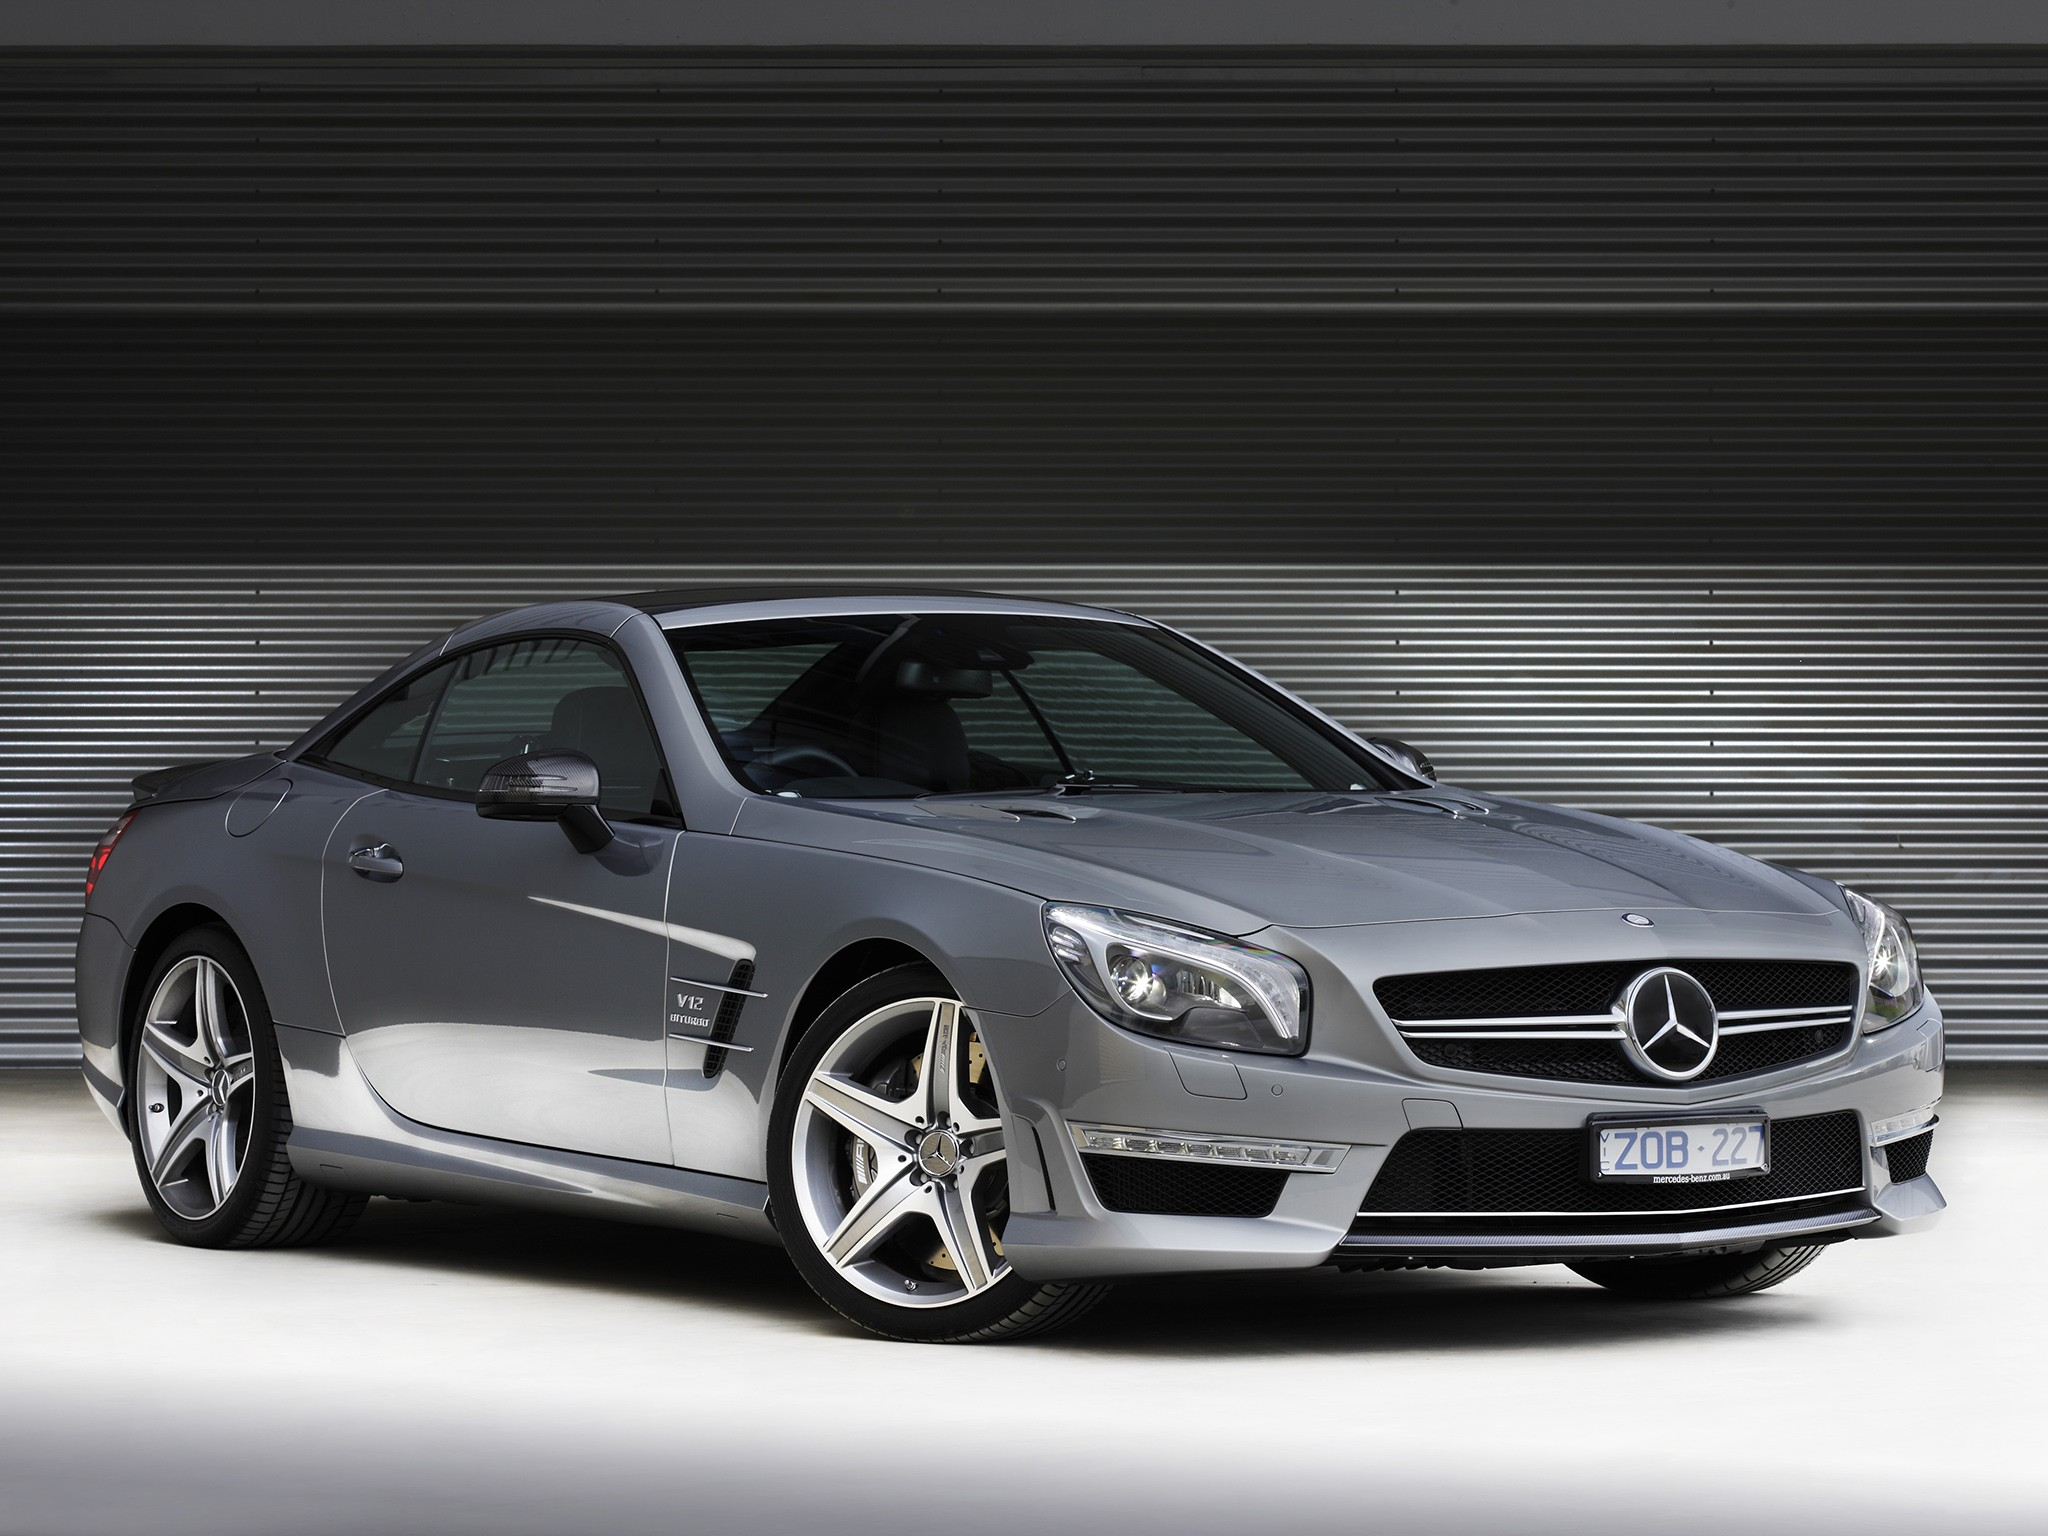 Mercedes benz sl 65 amg r231 2012 2013 2014 2015 for Mercedes benz sl65